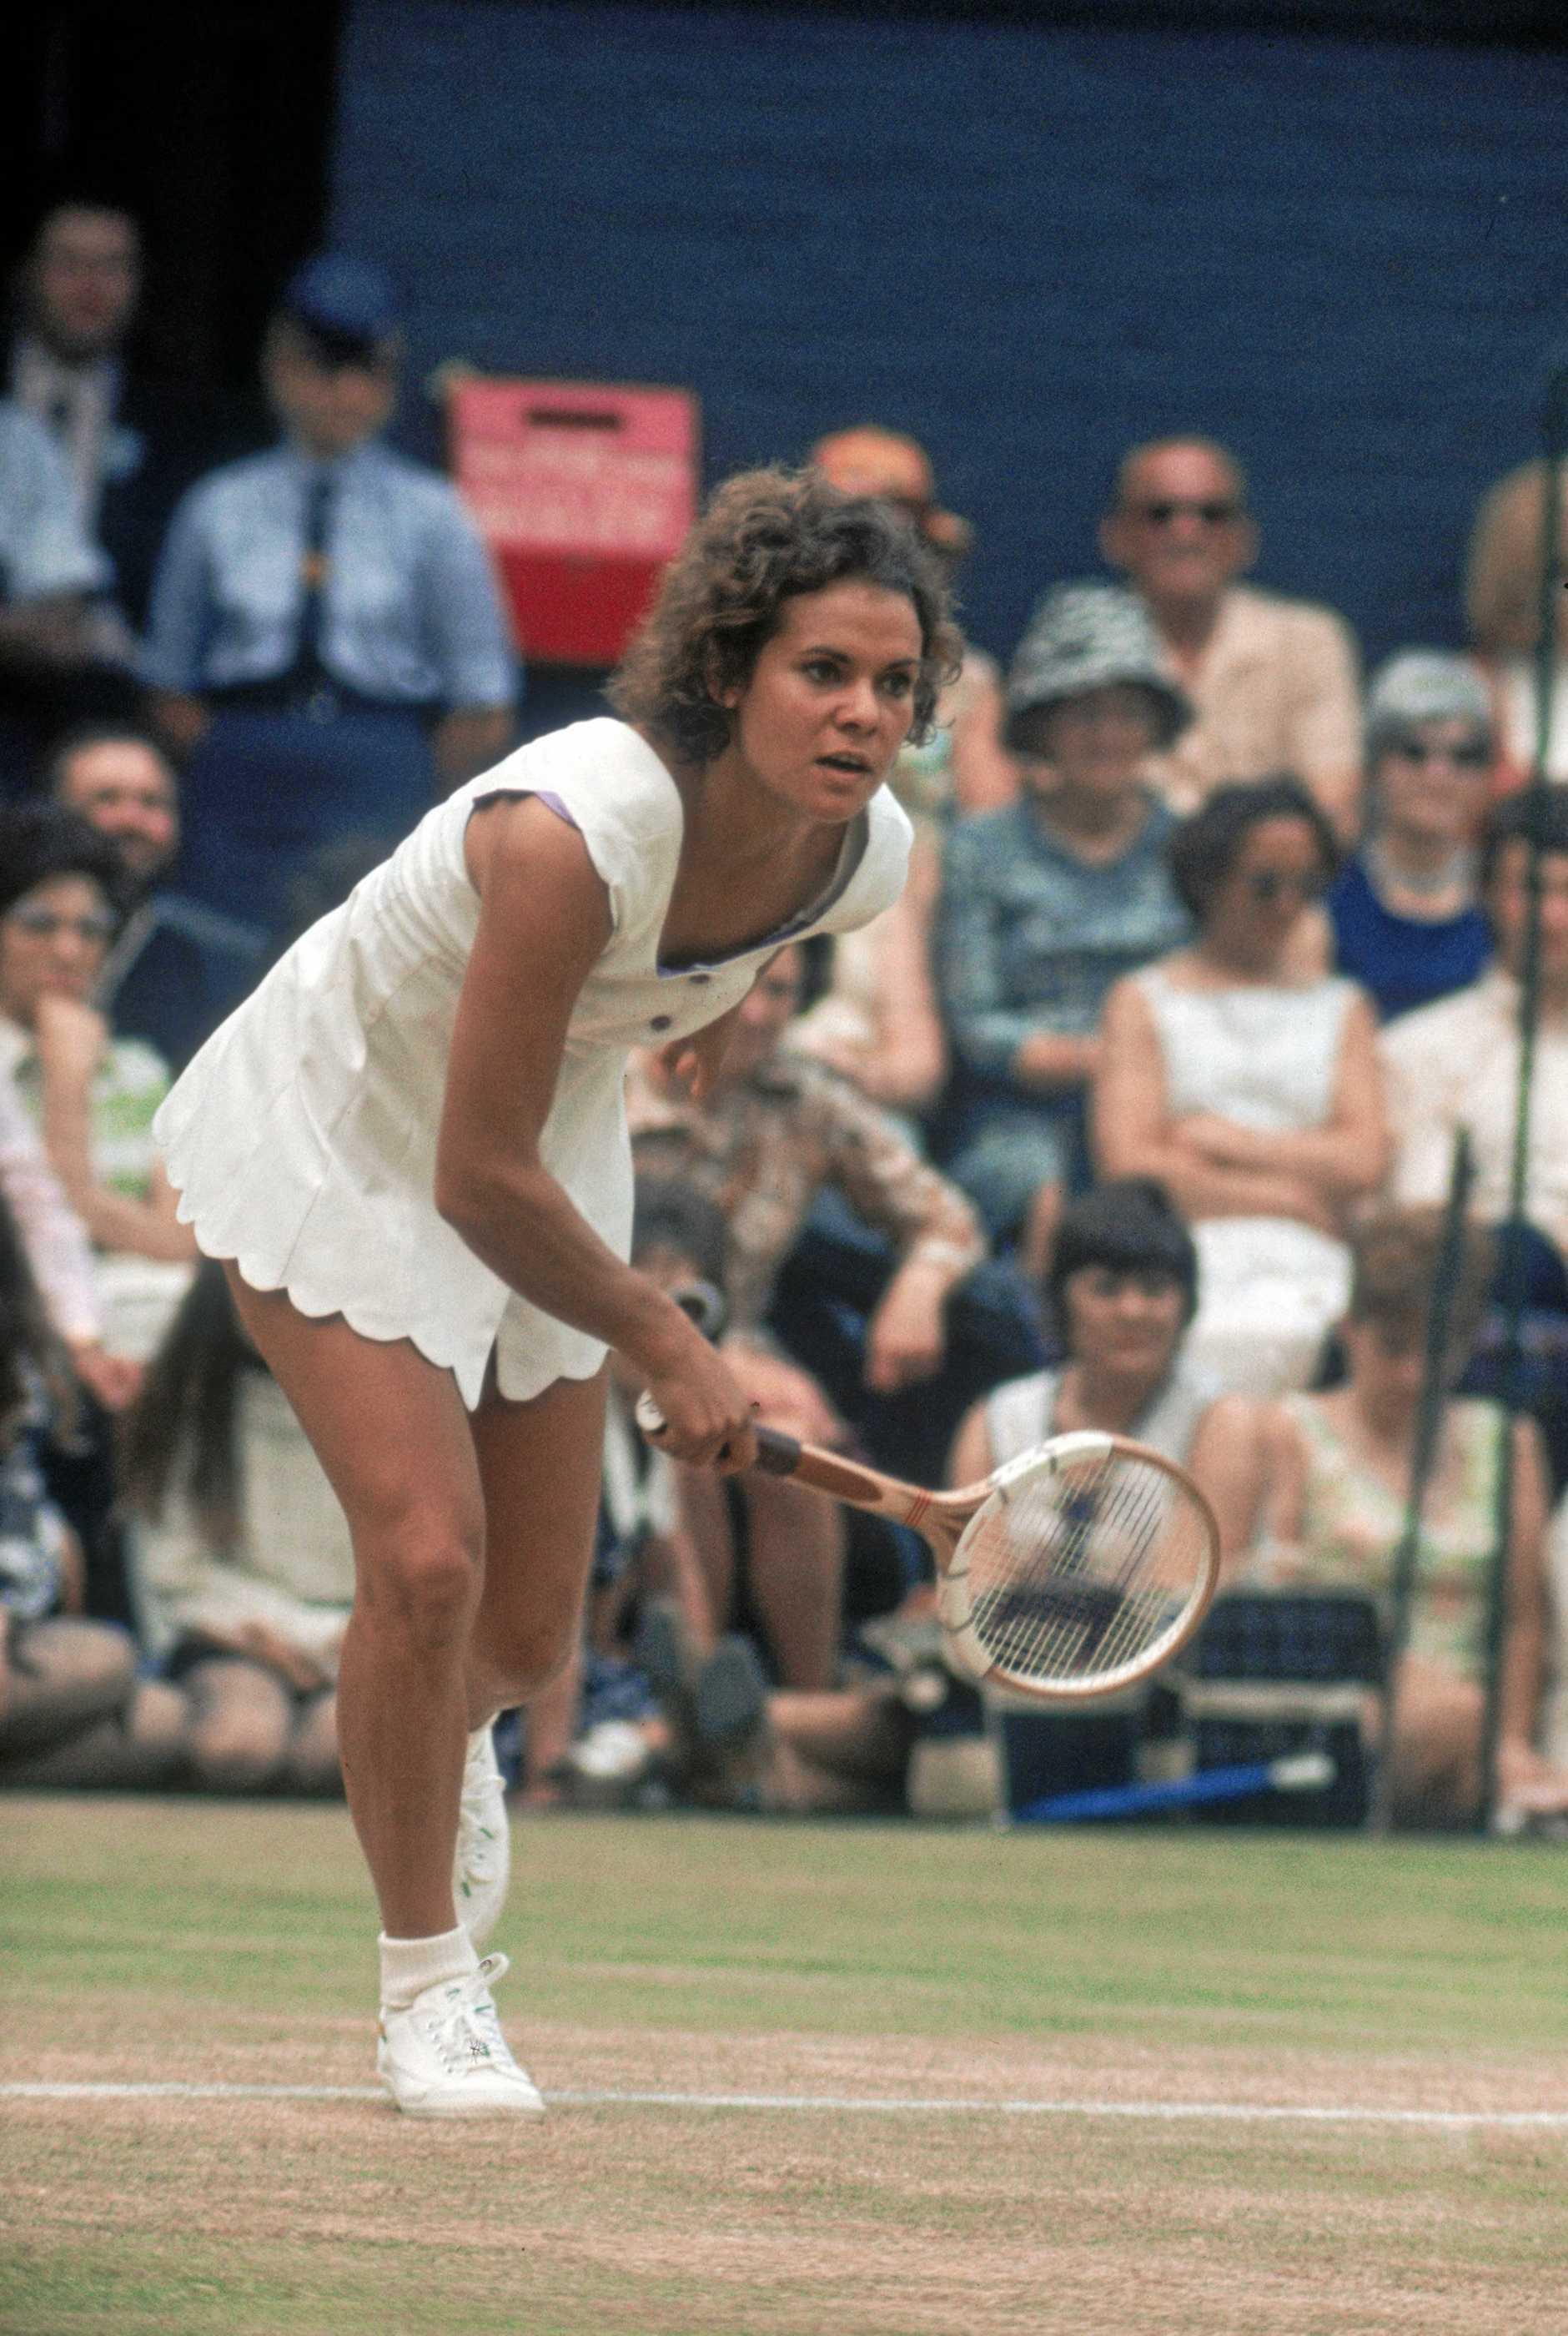 ON COURT:  Evonne Goolagong Cawley in 1980.